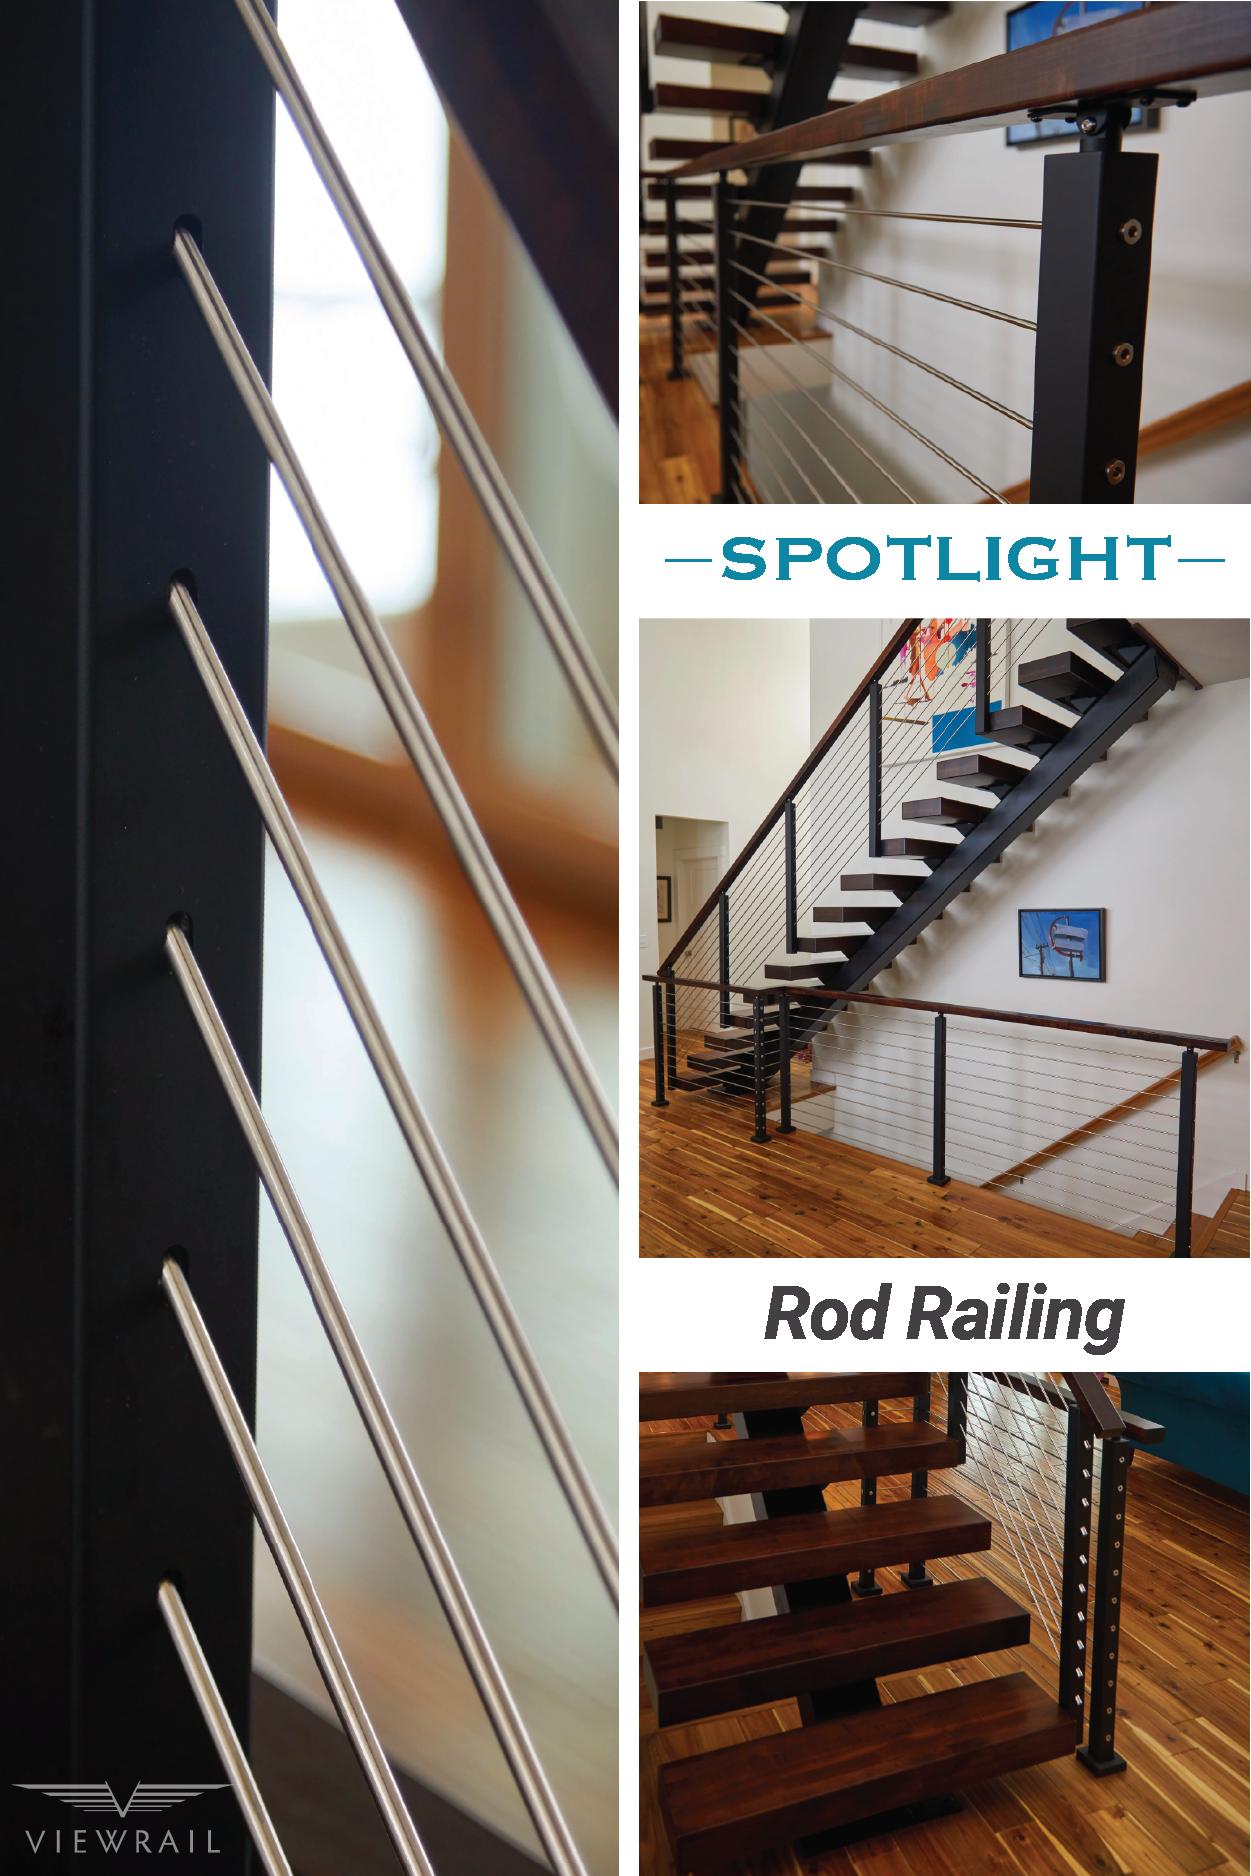 Stainless Steel Railing | Stair railing kits, Modern ...